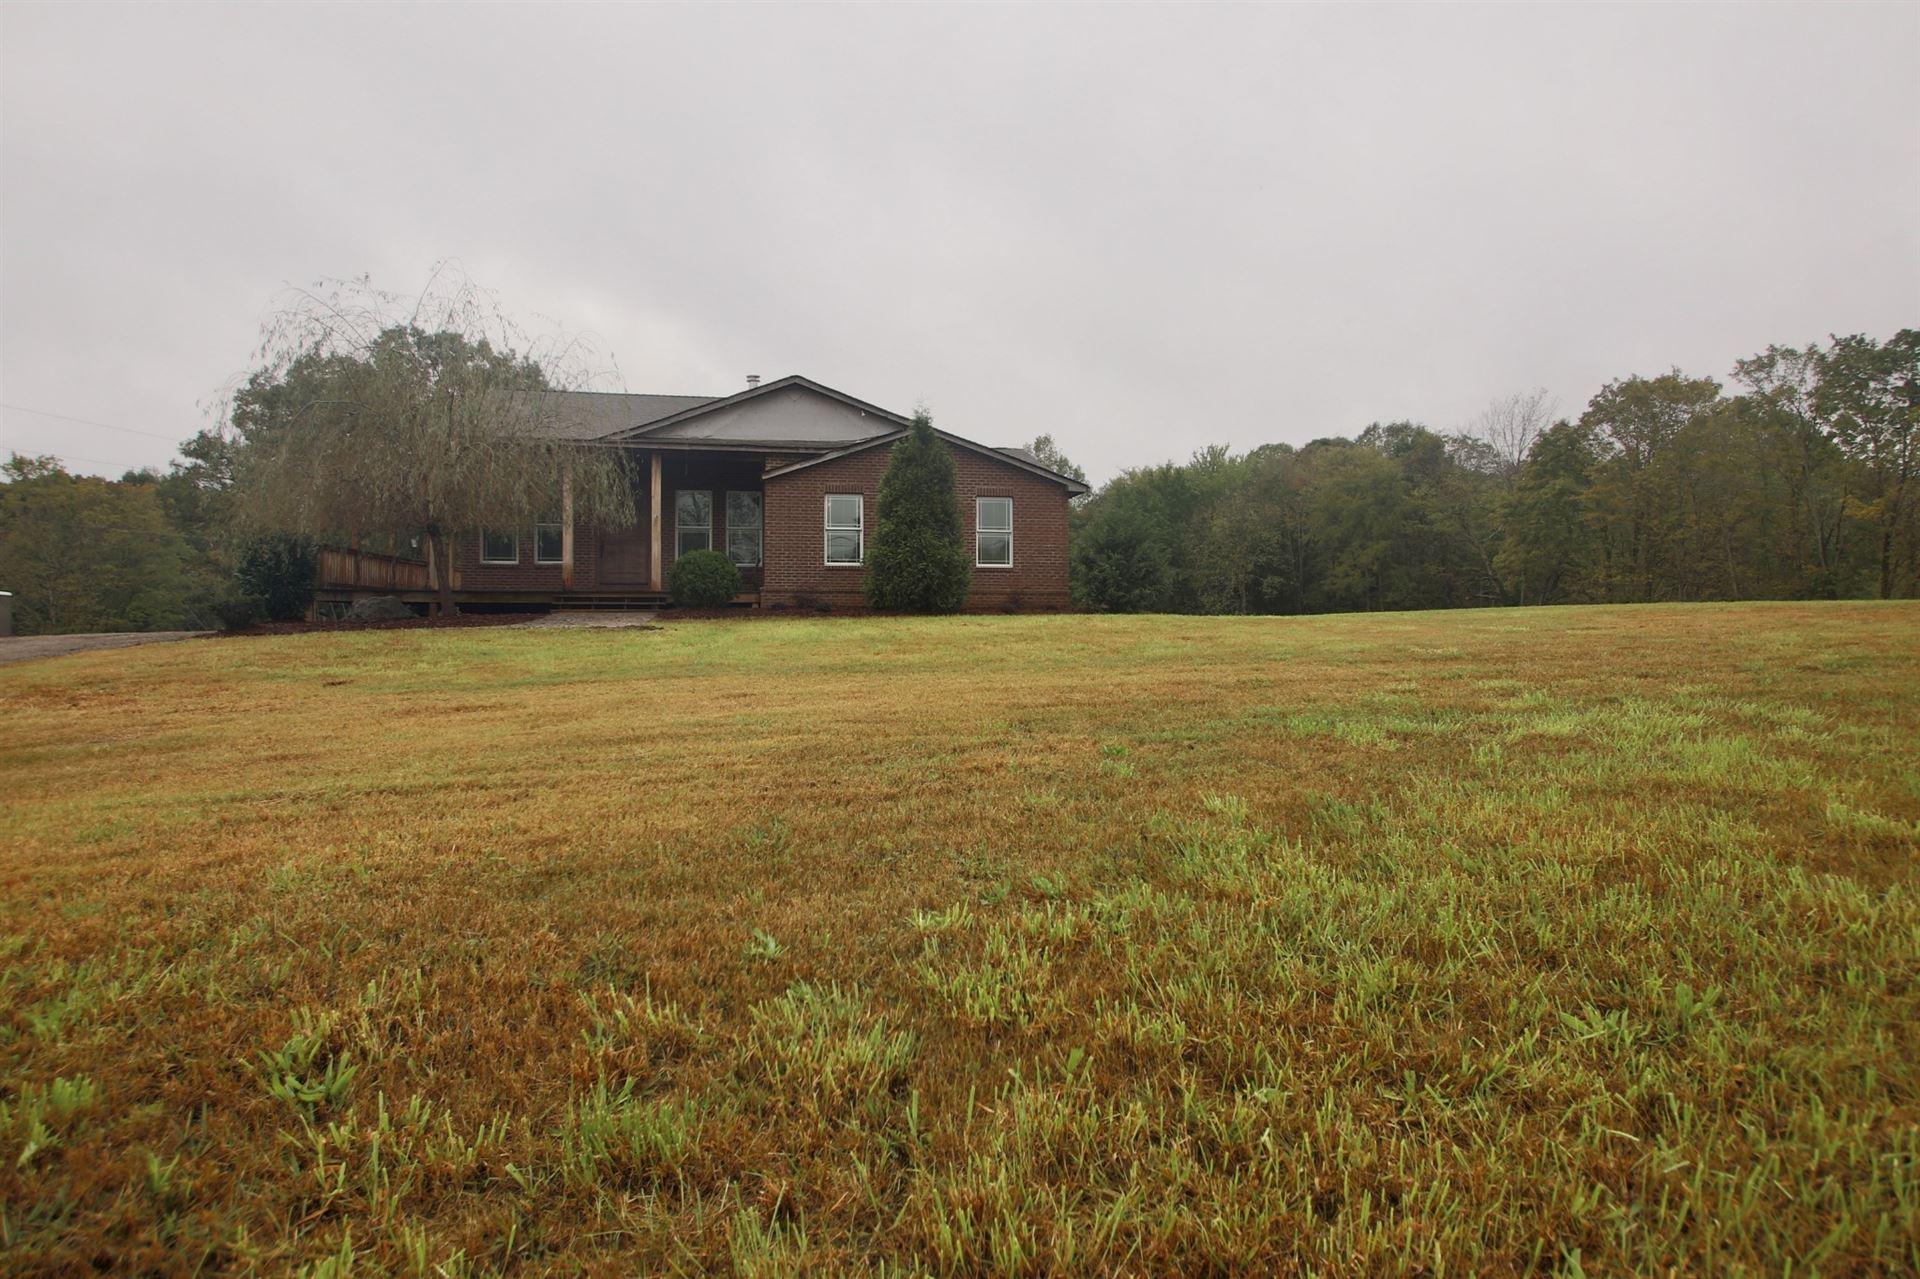 Photo of 2475 Old Clarksville Pike, Ashland City, TN 37015 (MLS # 2300586)